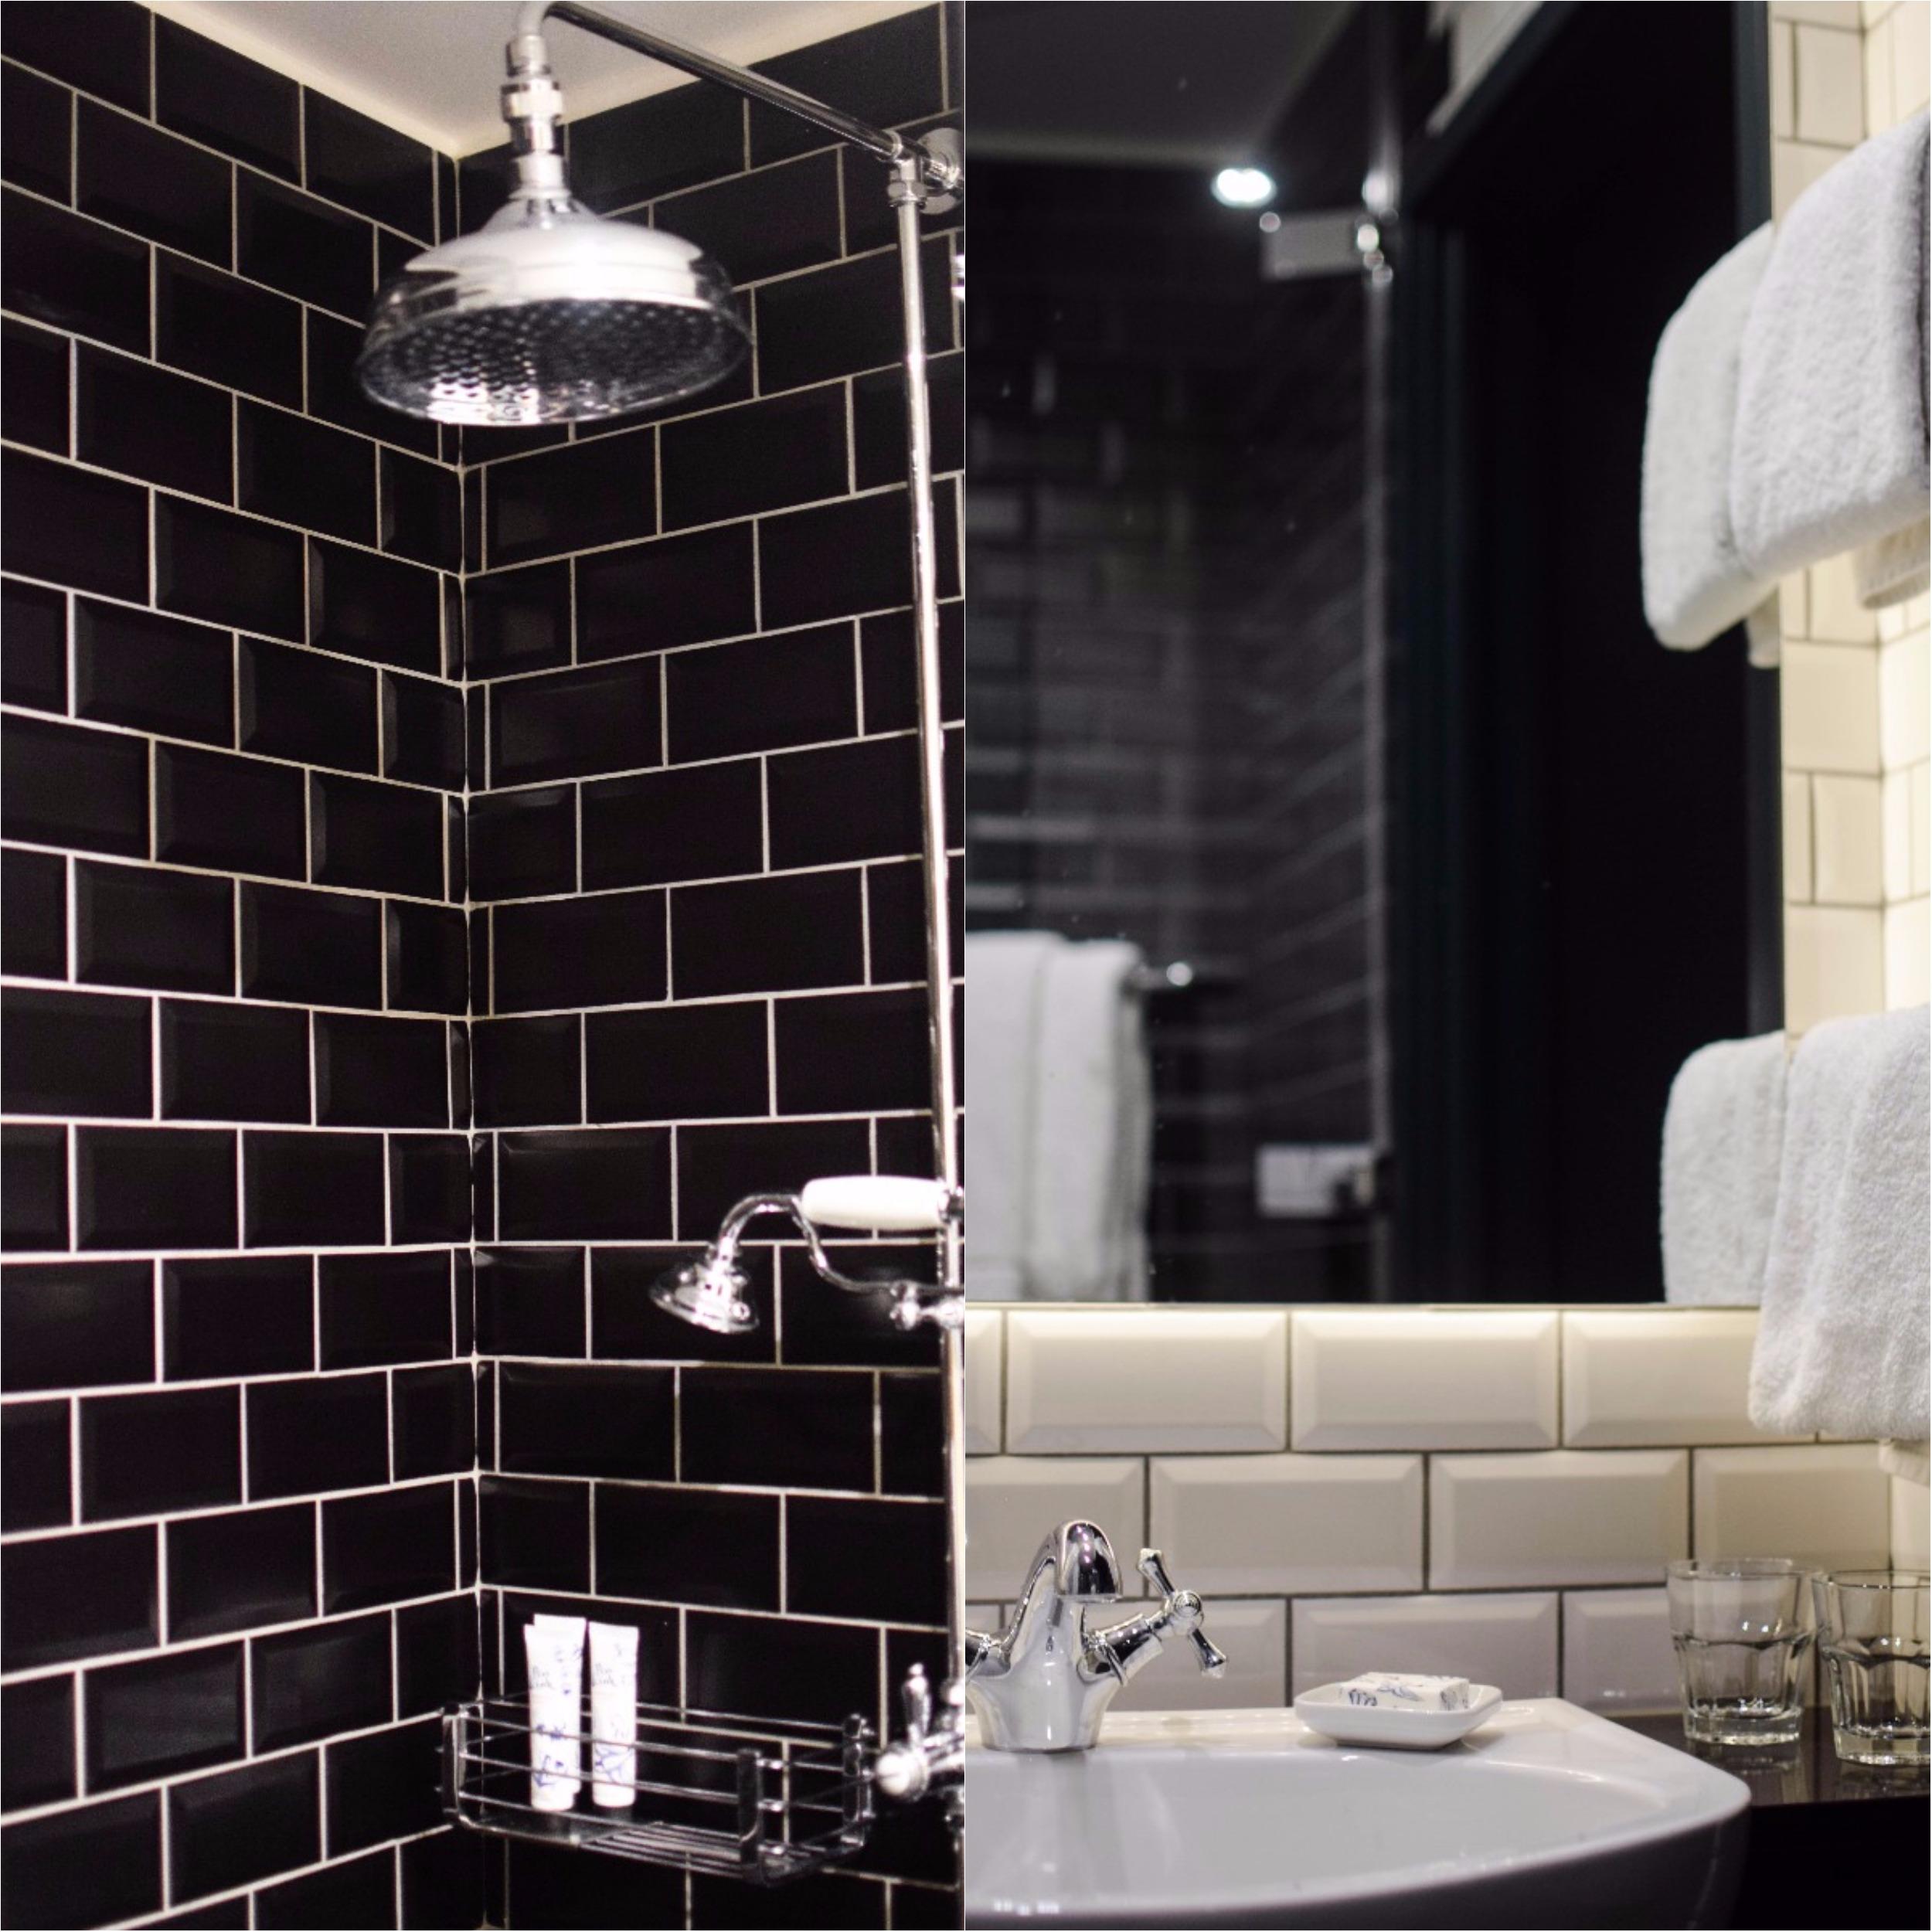 The Hoxton Cozy Room Bathroom 1